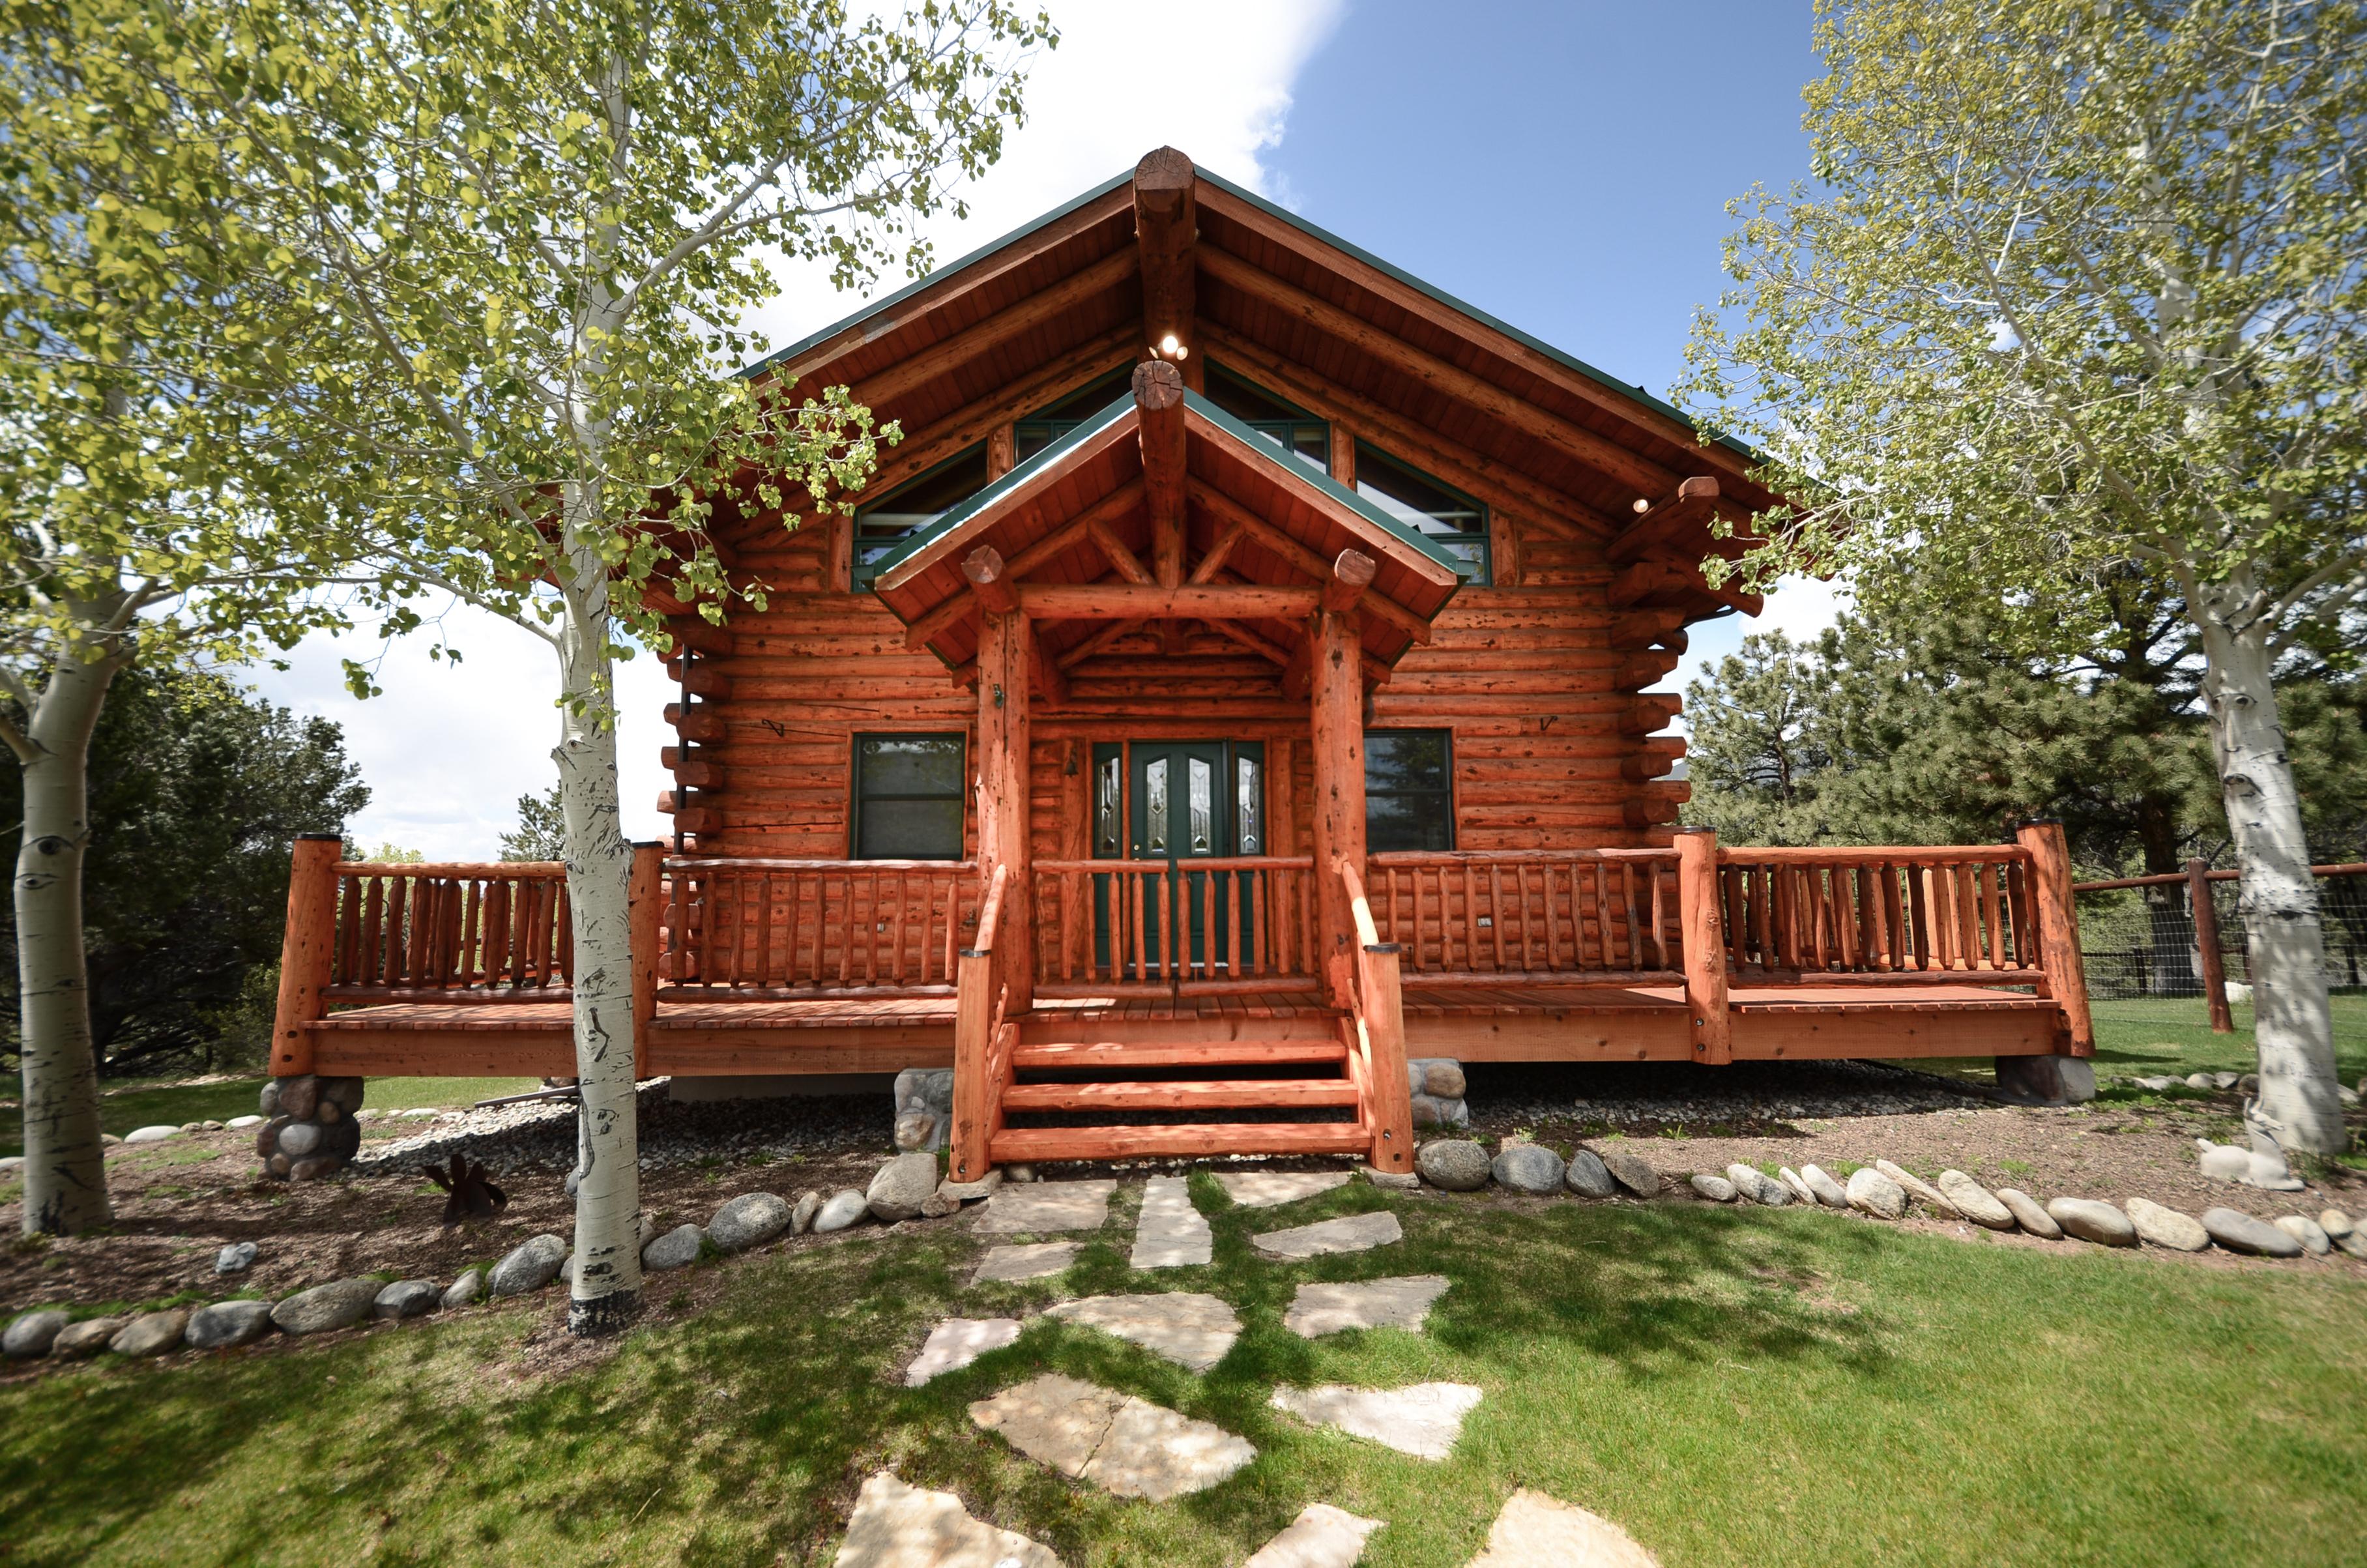 Collegiate Peaks Scenic Ranch